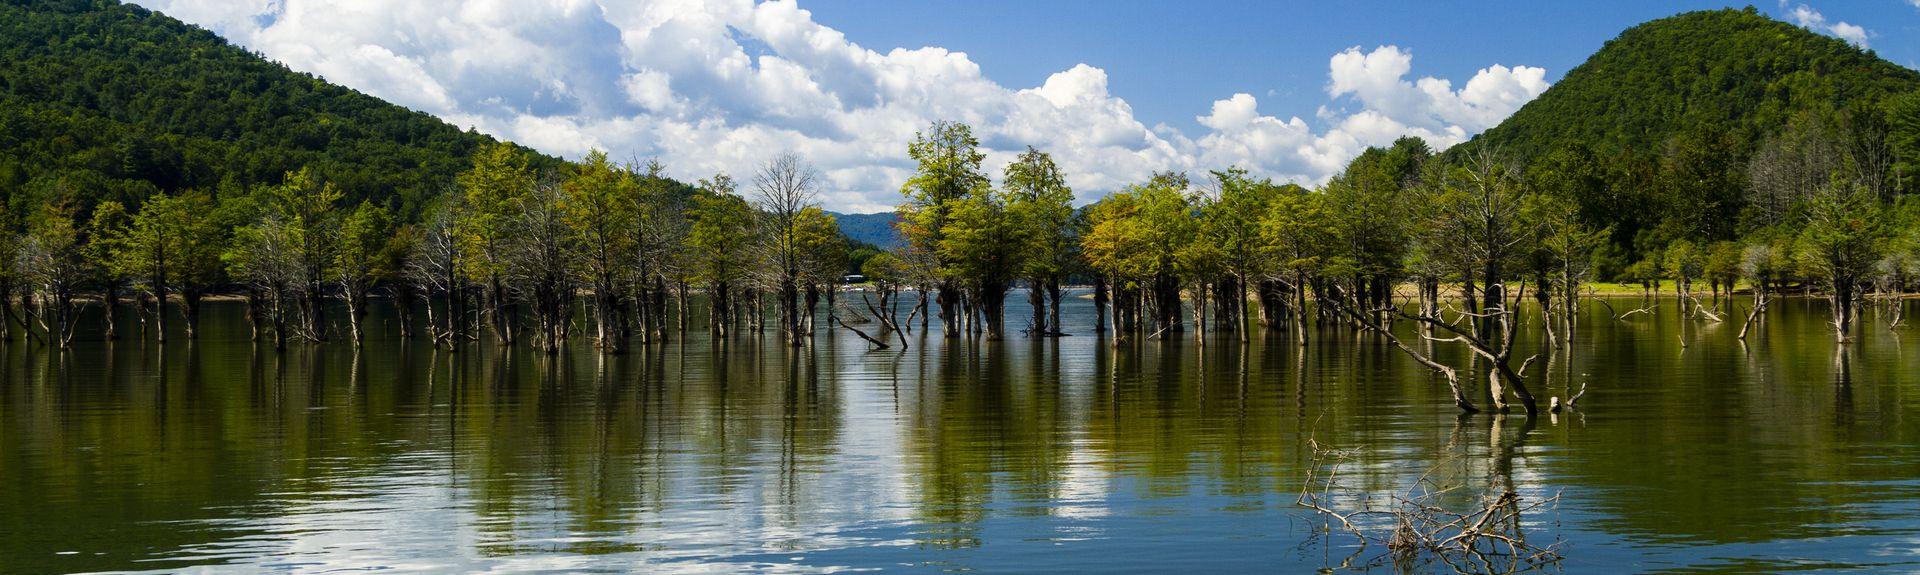 Watauga Lake, Butler, Tennessee, United States of America